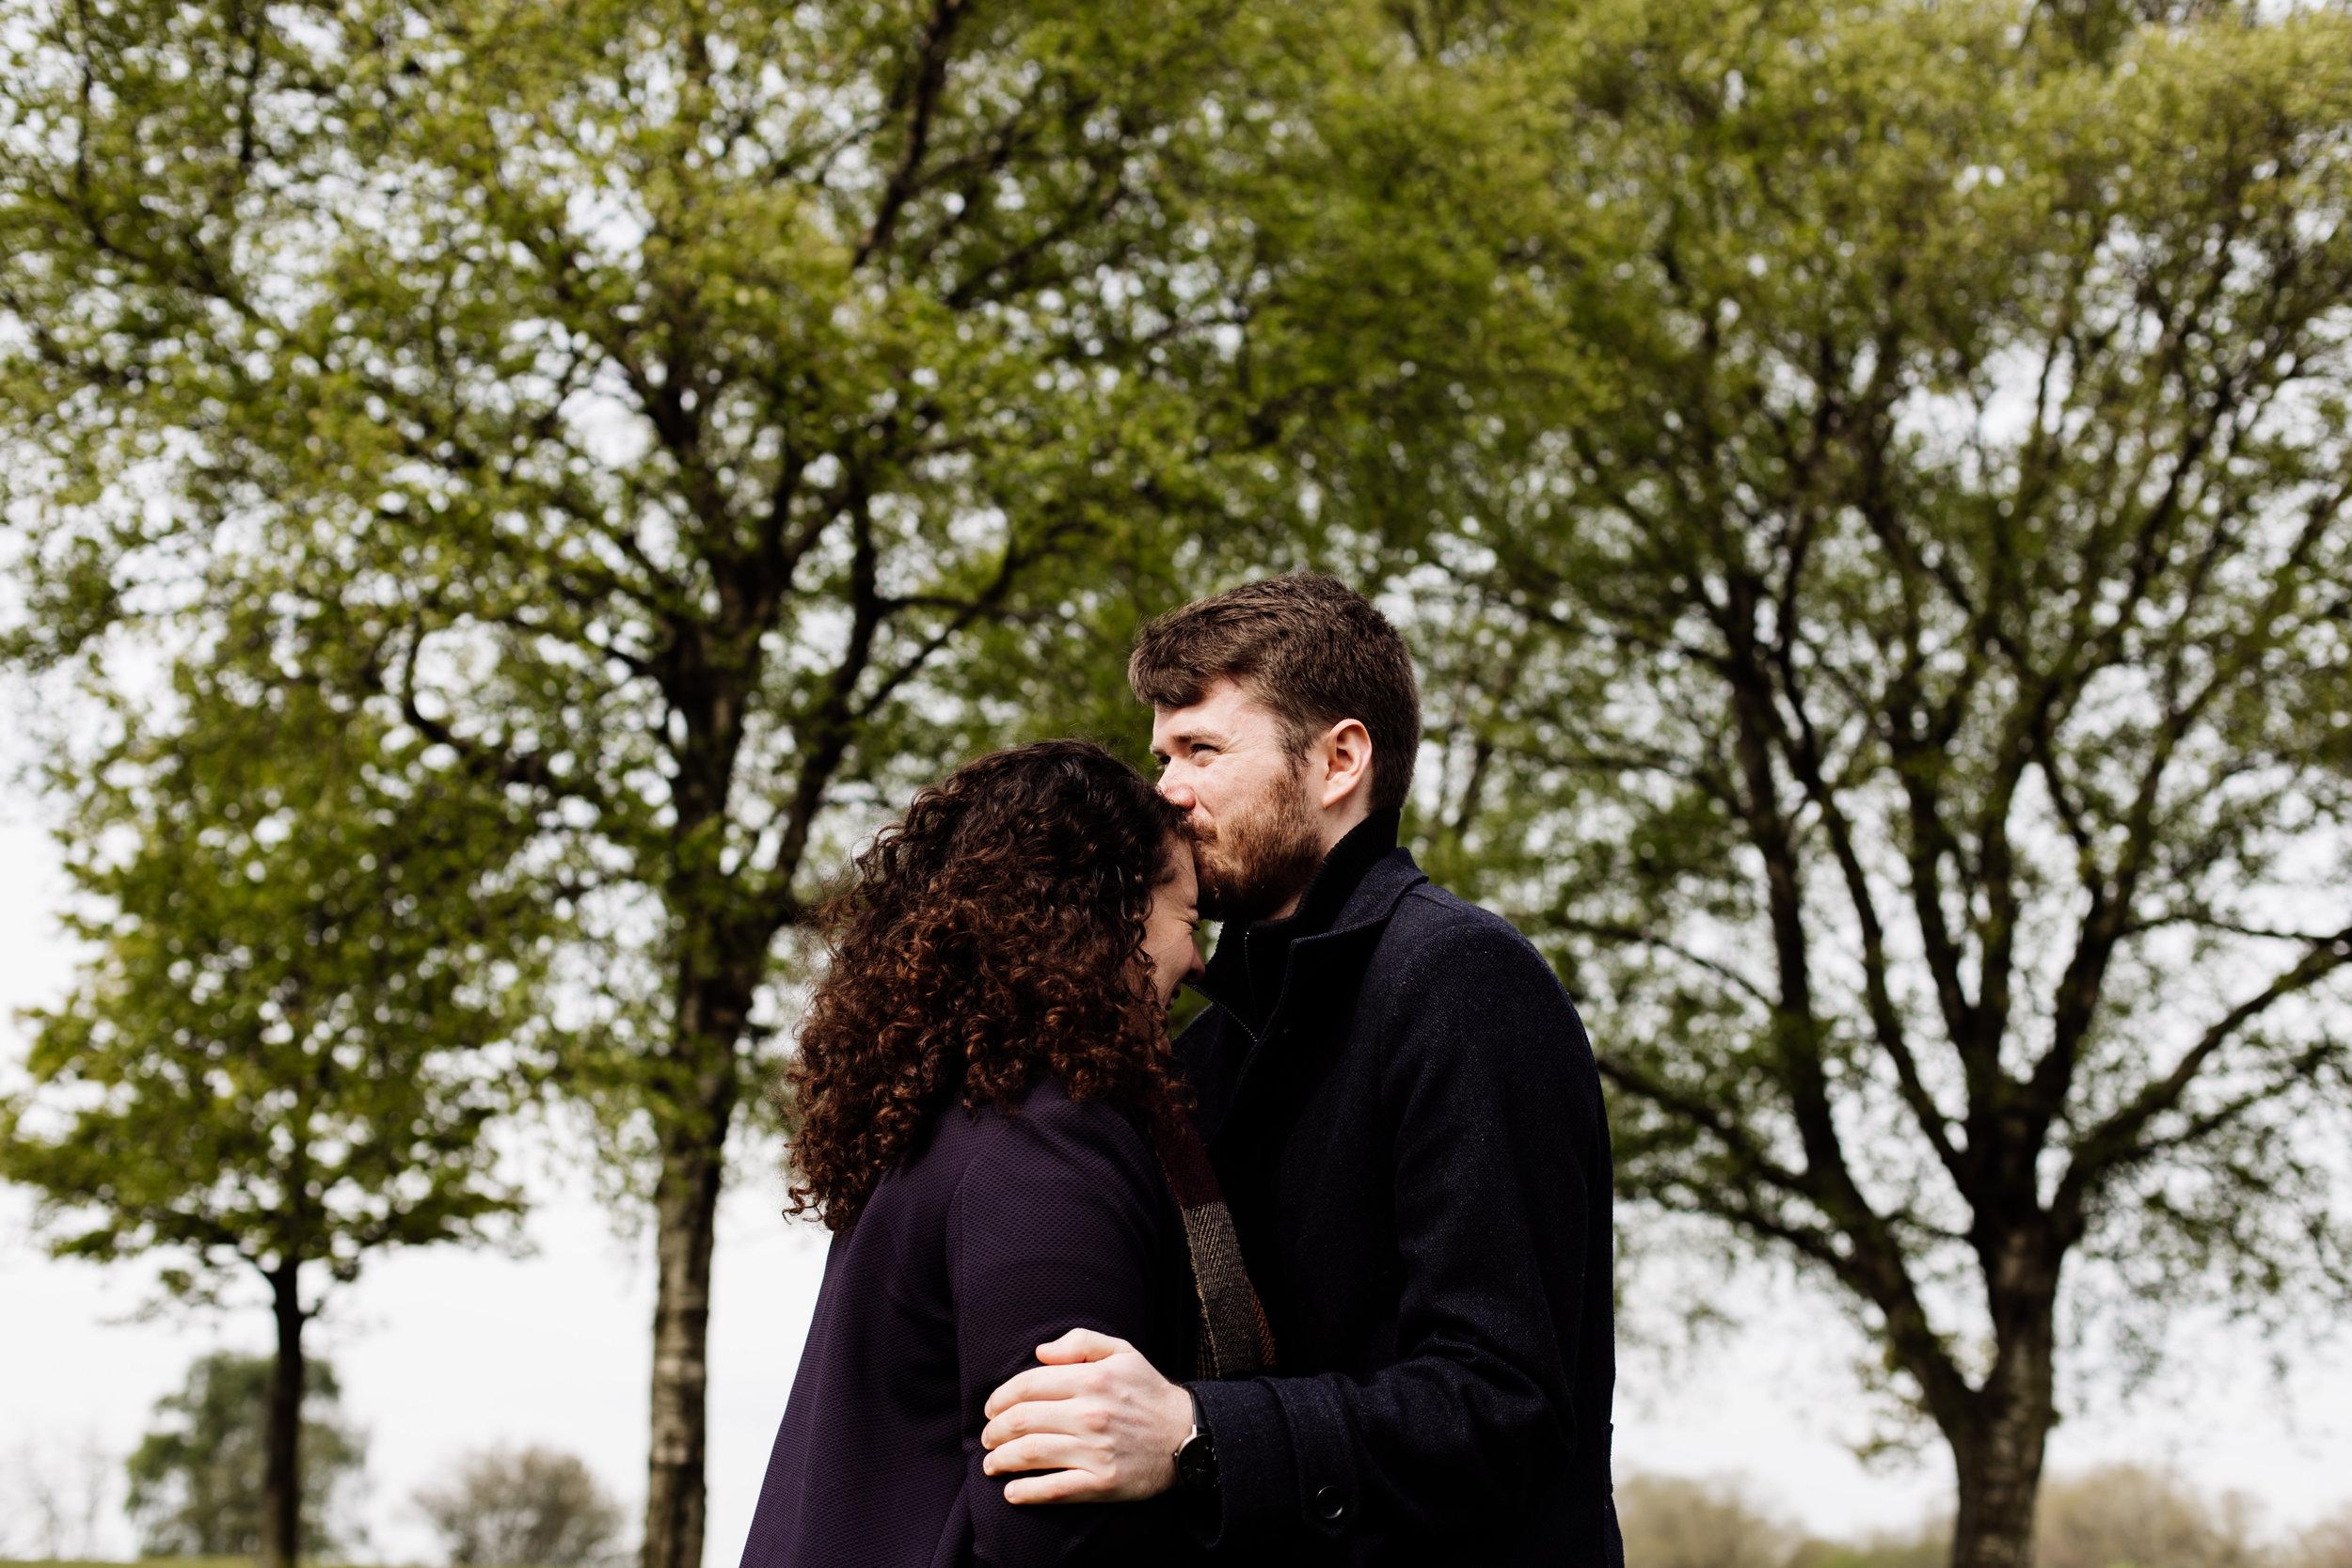 Isobel-and-Daniel-PreWeddingShoot-6.jpg